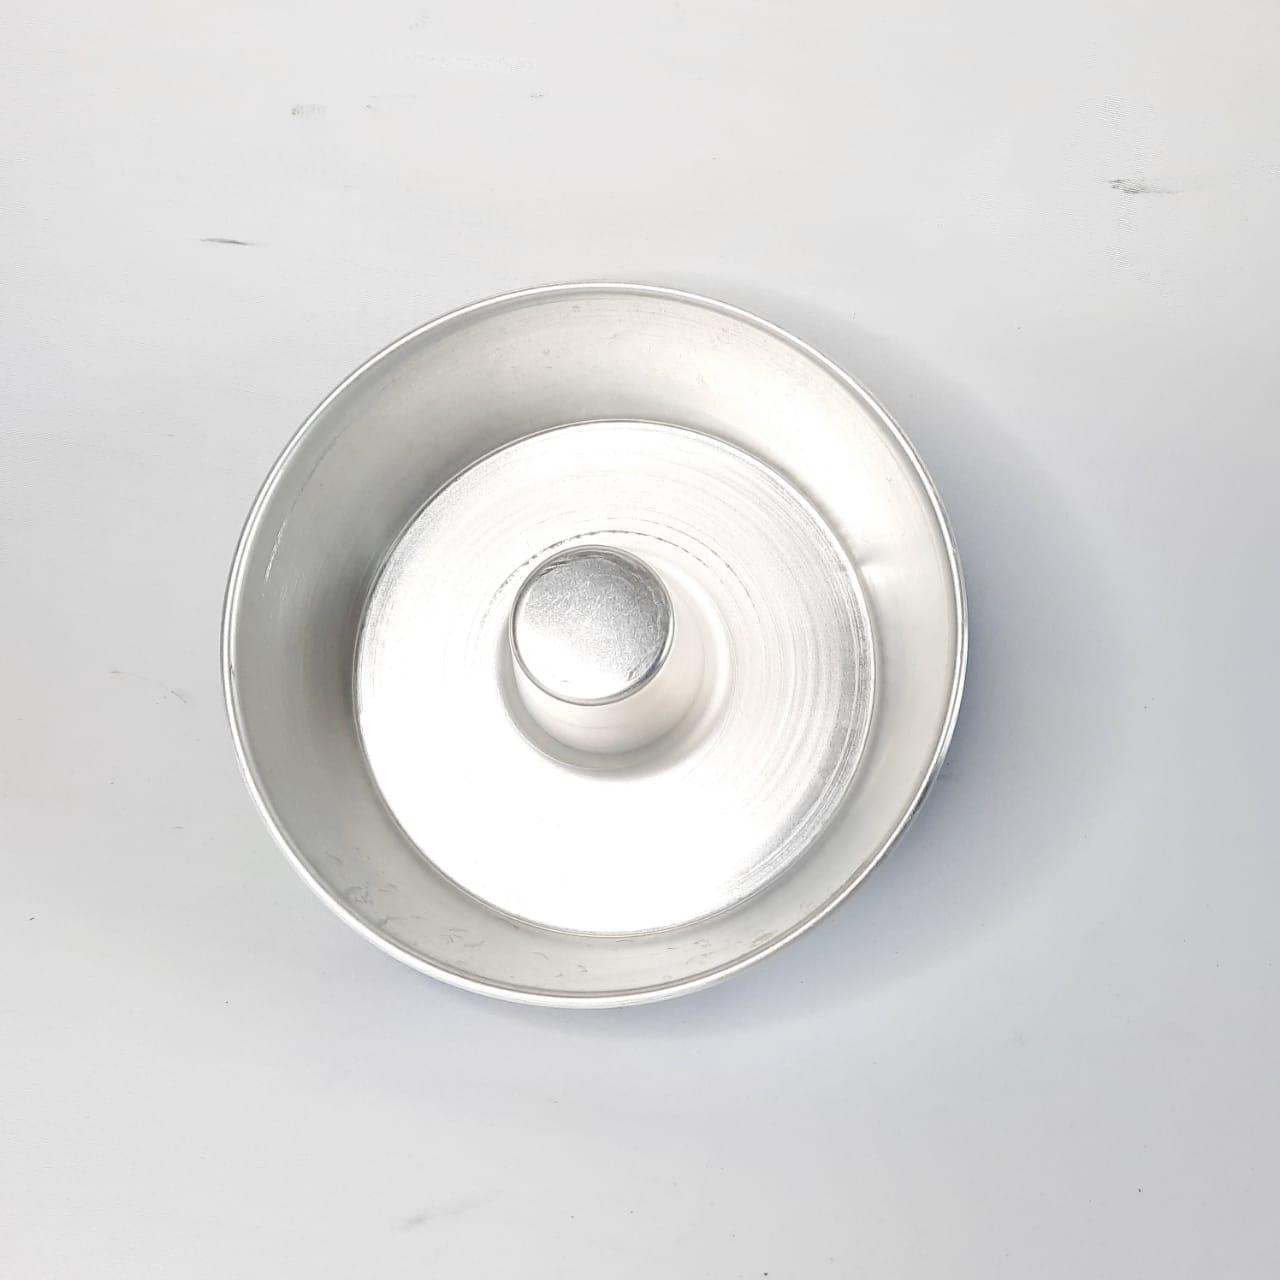 Forma Alumínio Bolo/Pudim N 22 Real